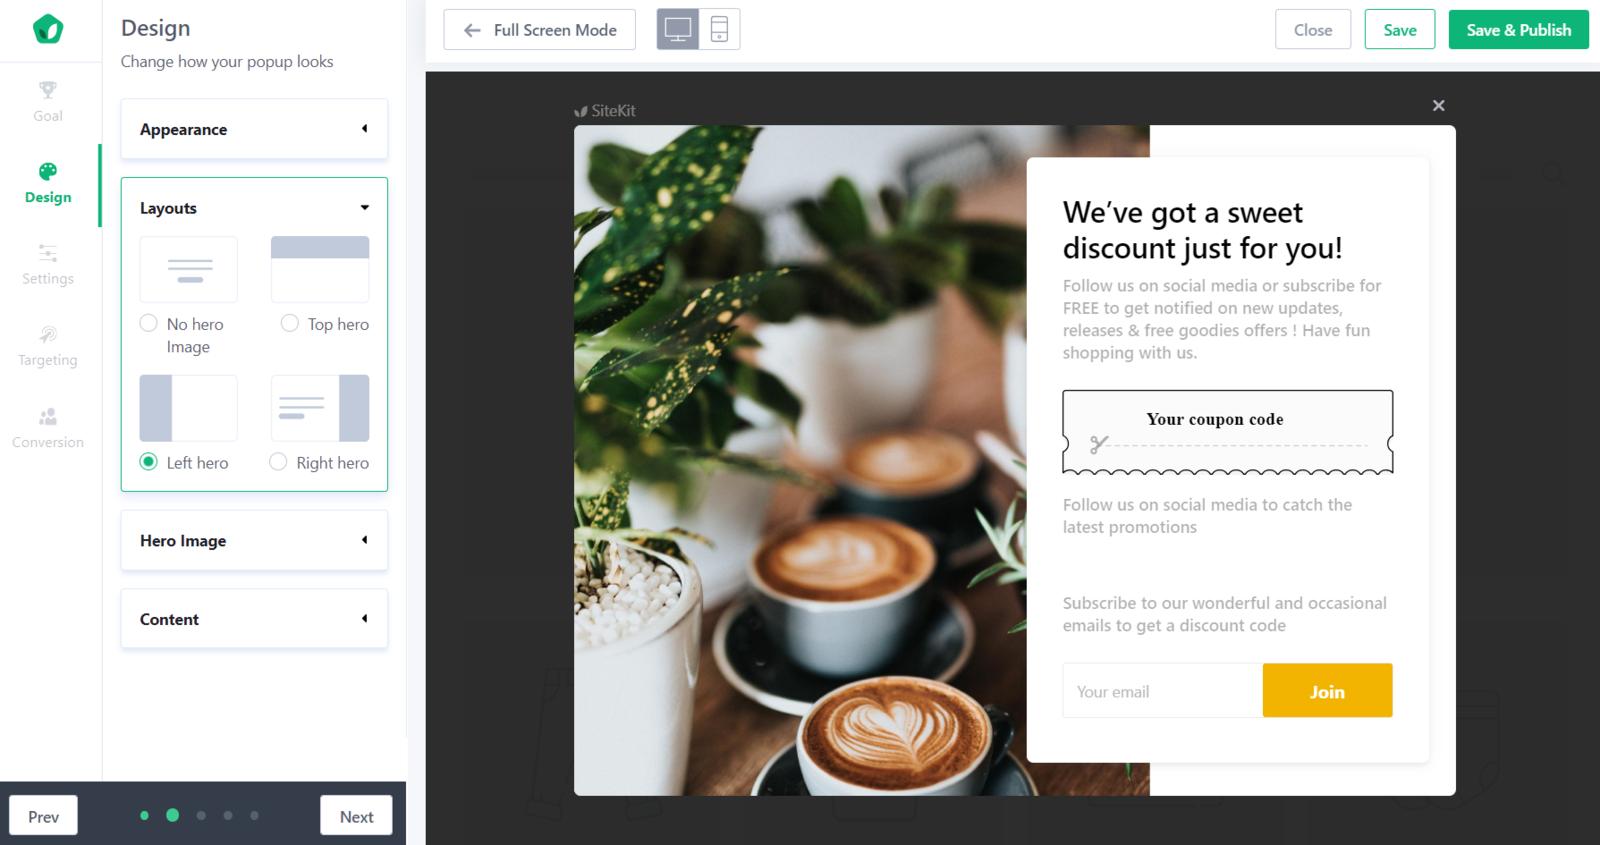 Step 3: Design tab